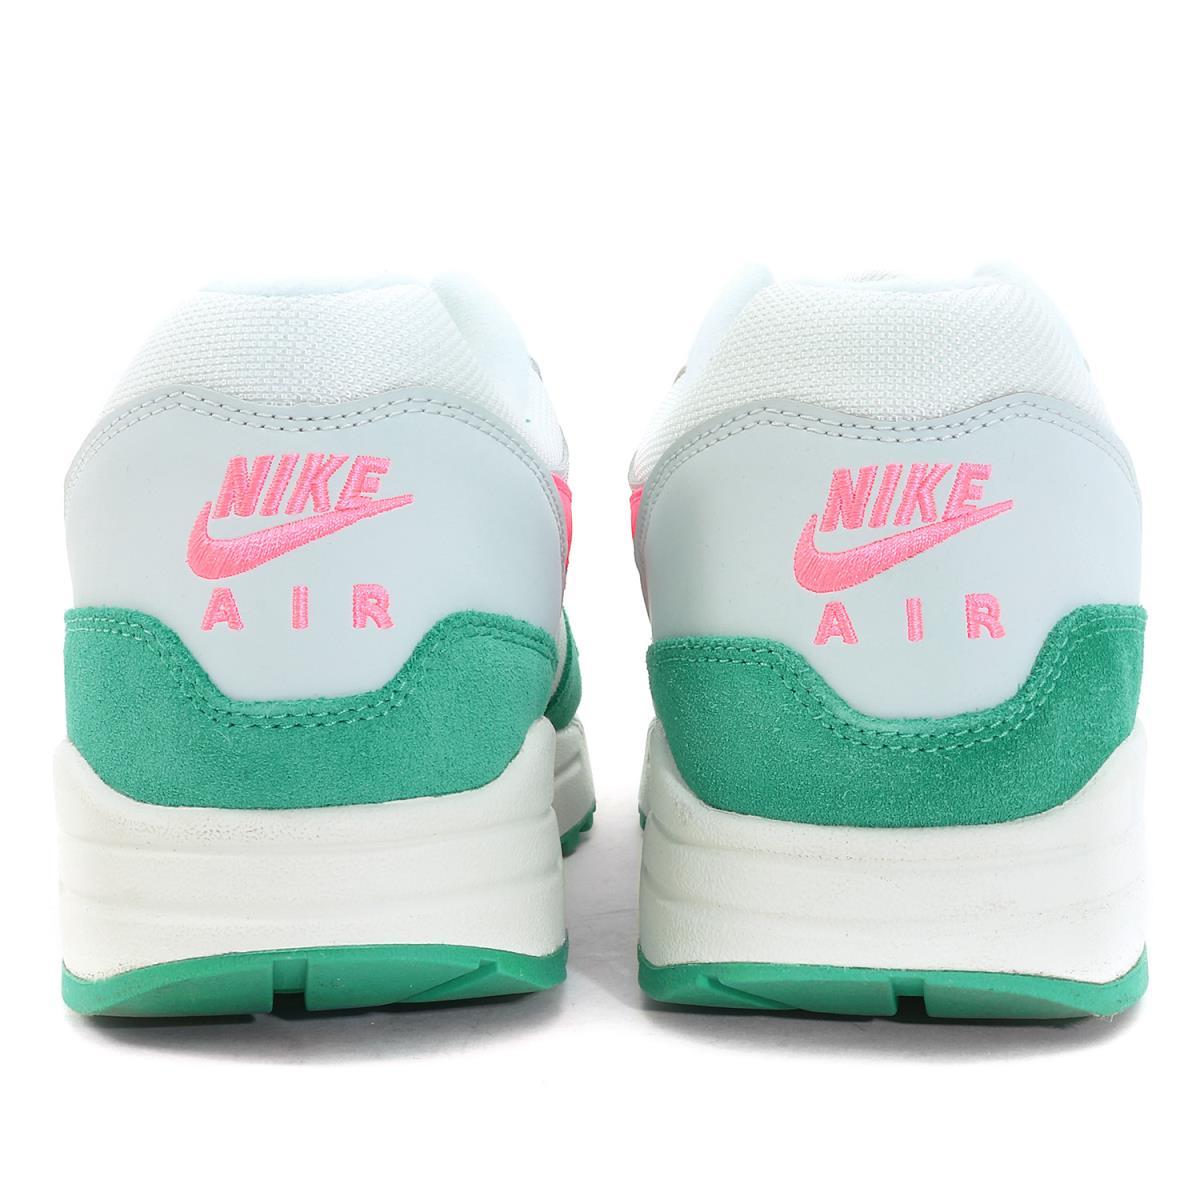 NIKE (Nike) AIR MAX 1 (AH8145 106) summit white X sunset pulse US9.5(27.5cm)